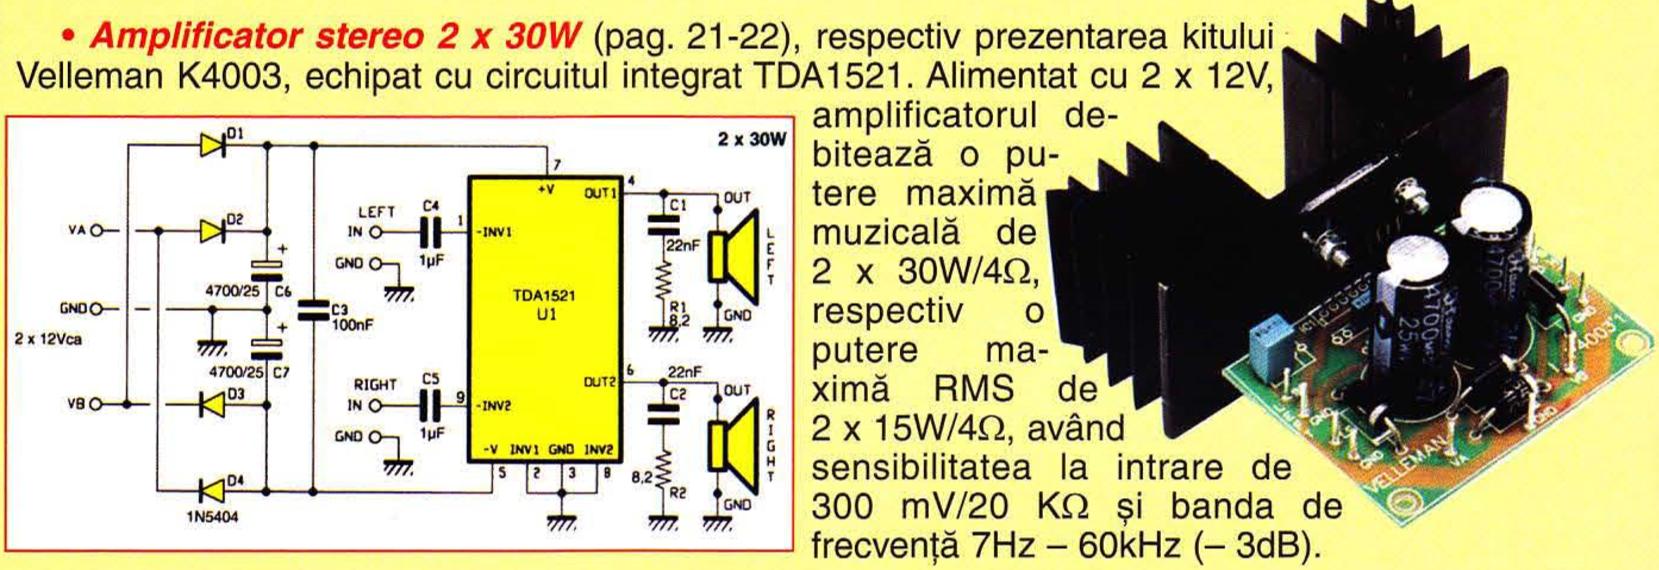 Amplificator Stereo 2x30W